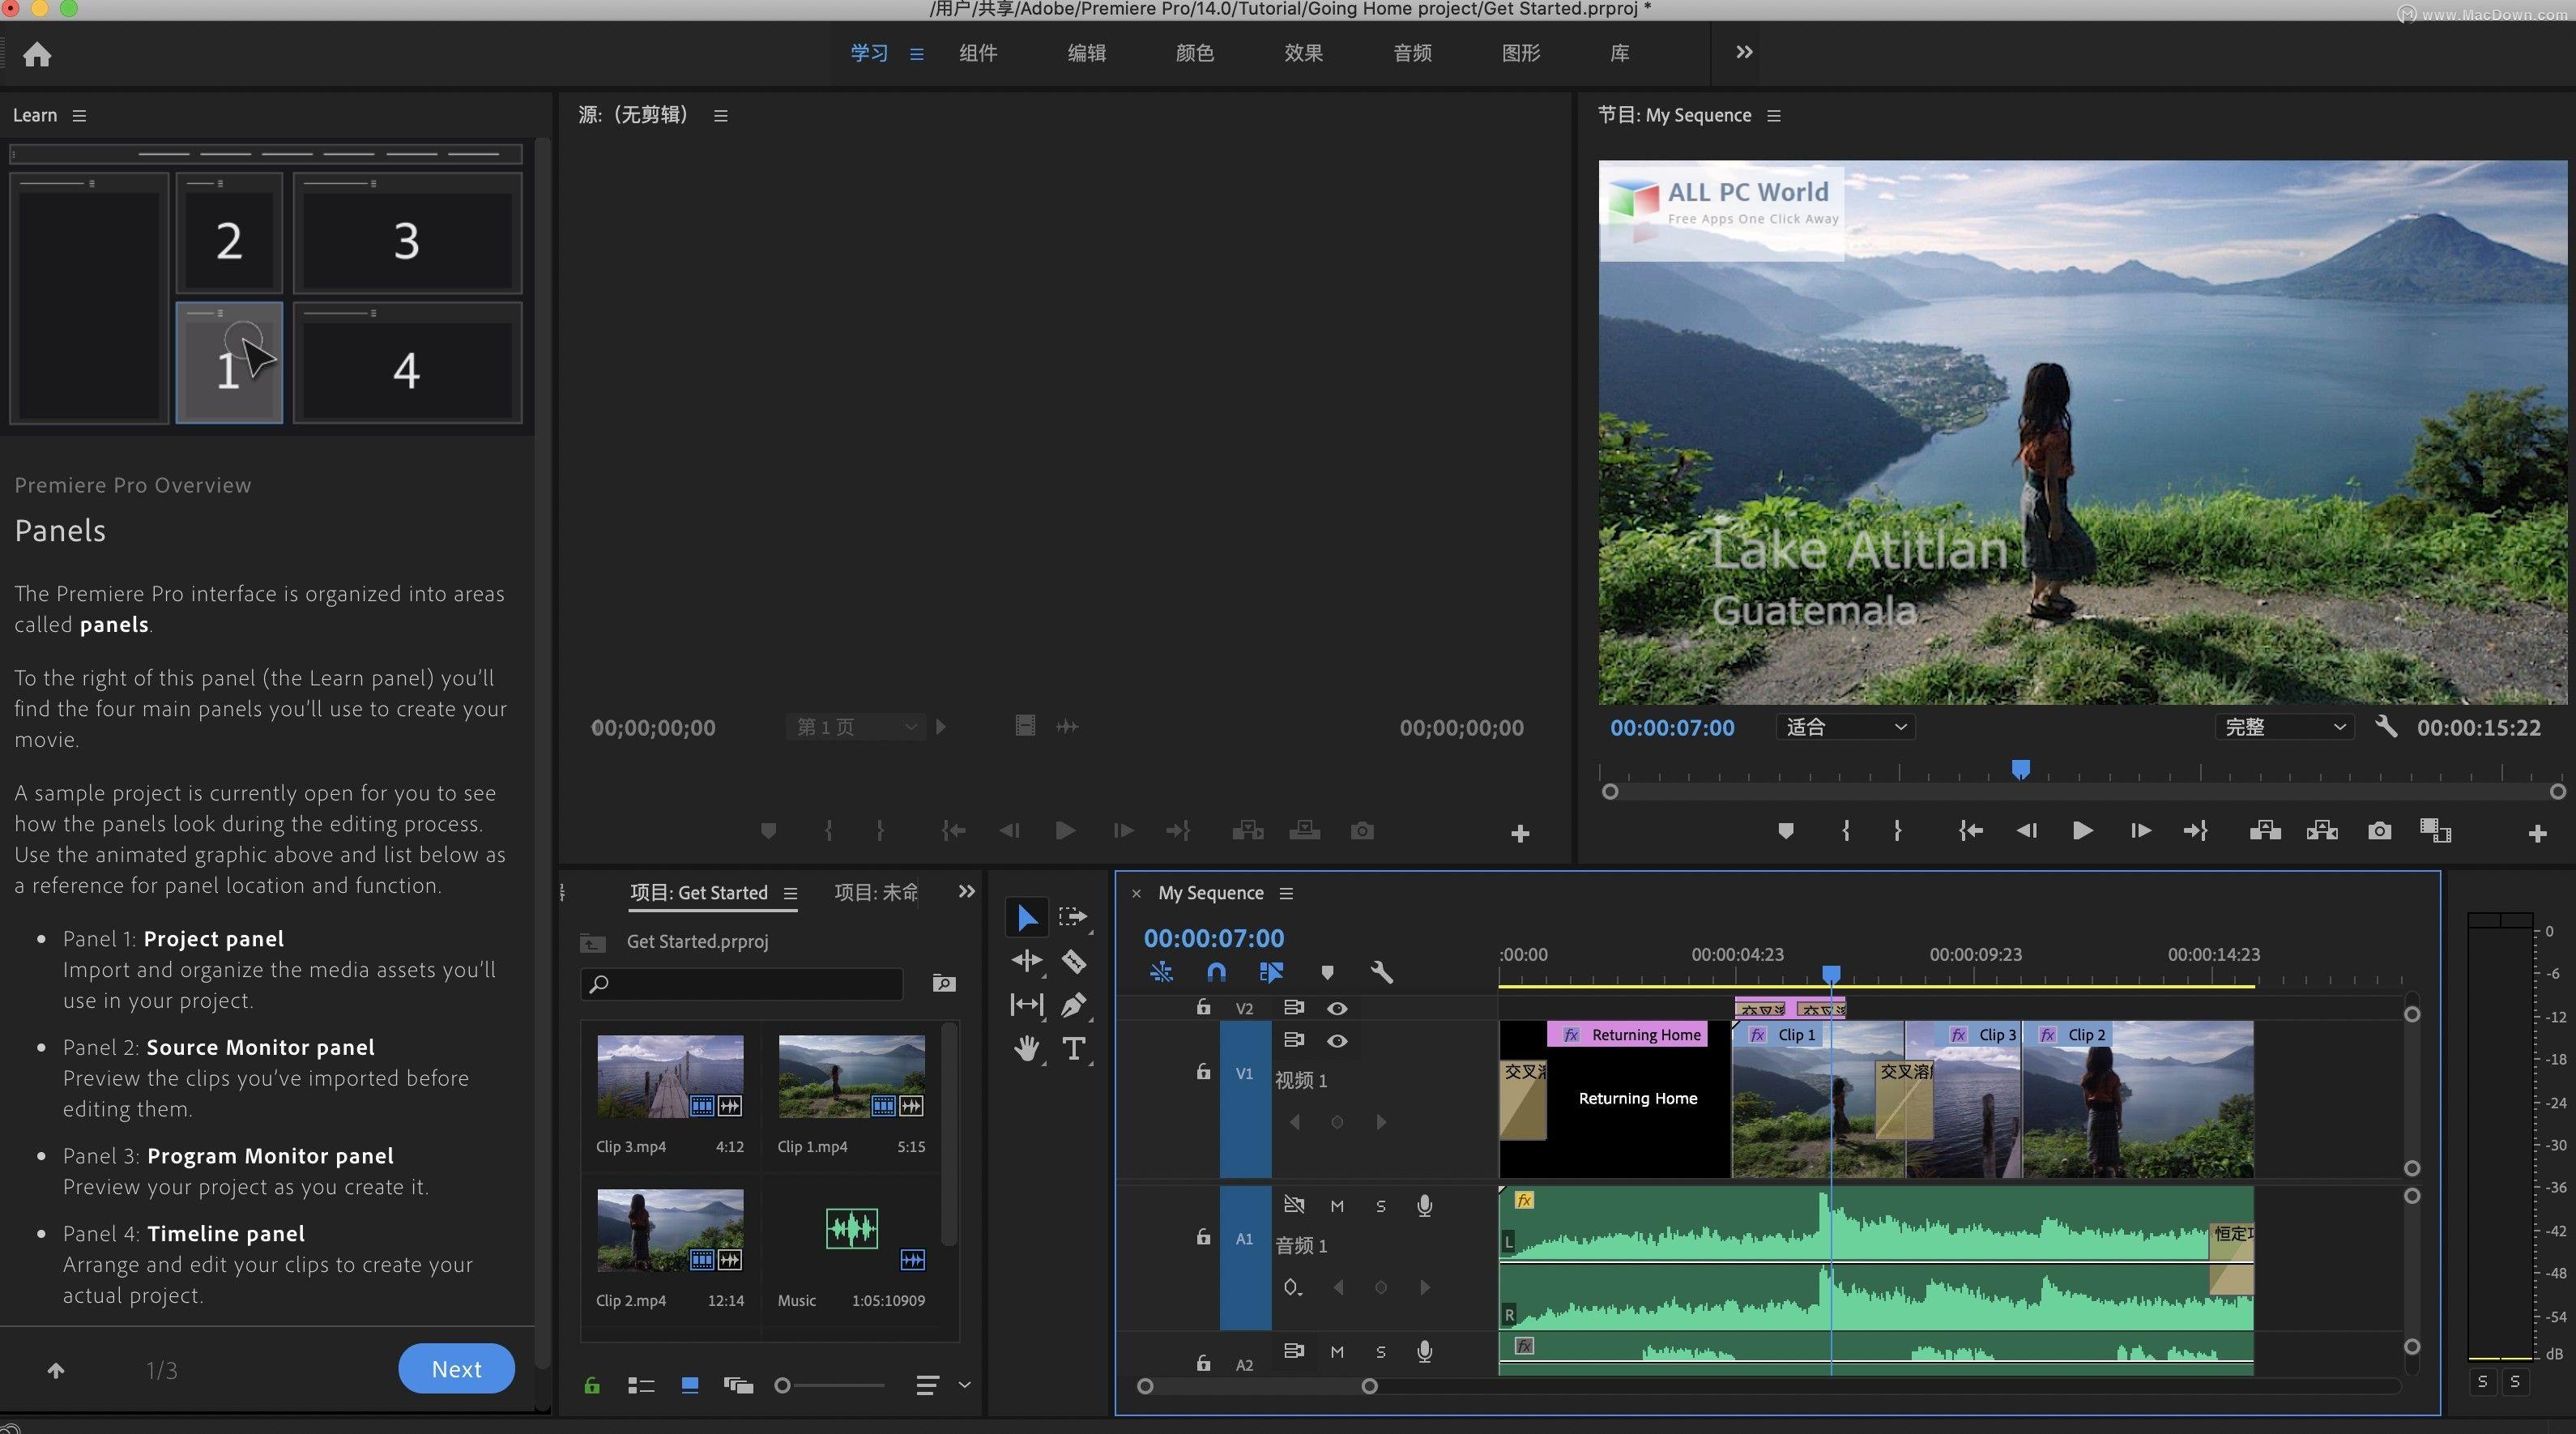 adobe premiere pro effects free download